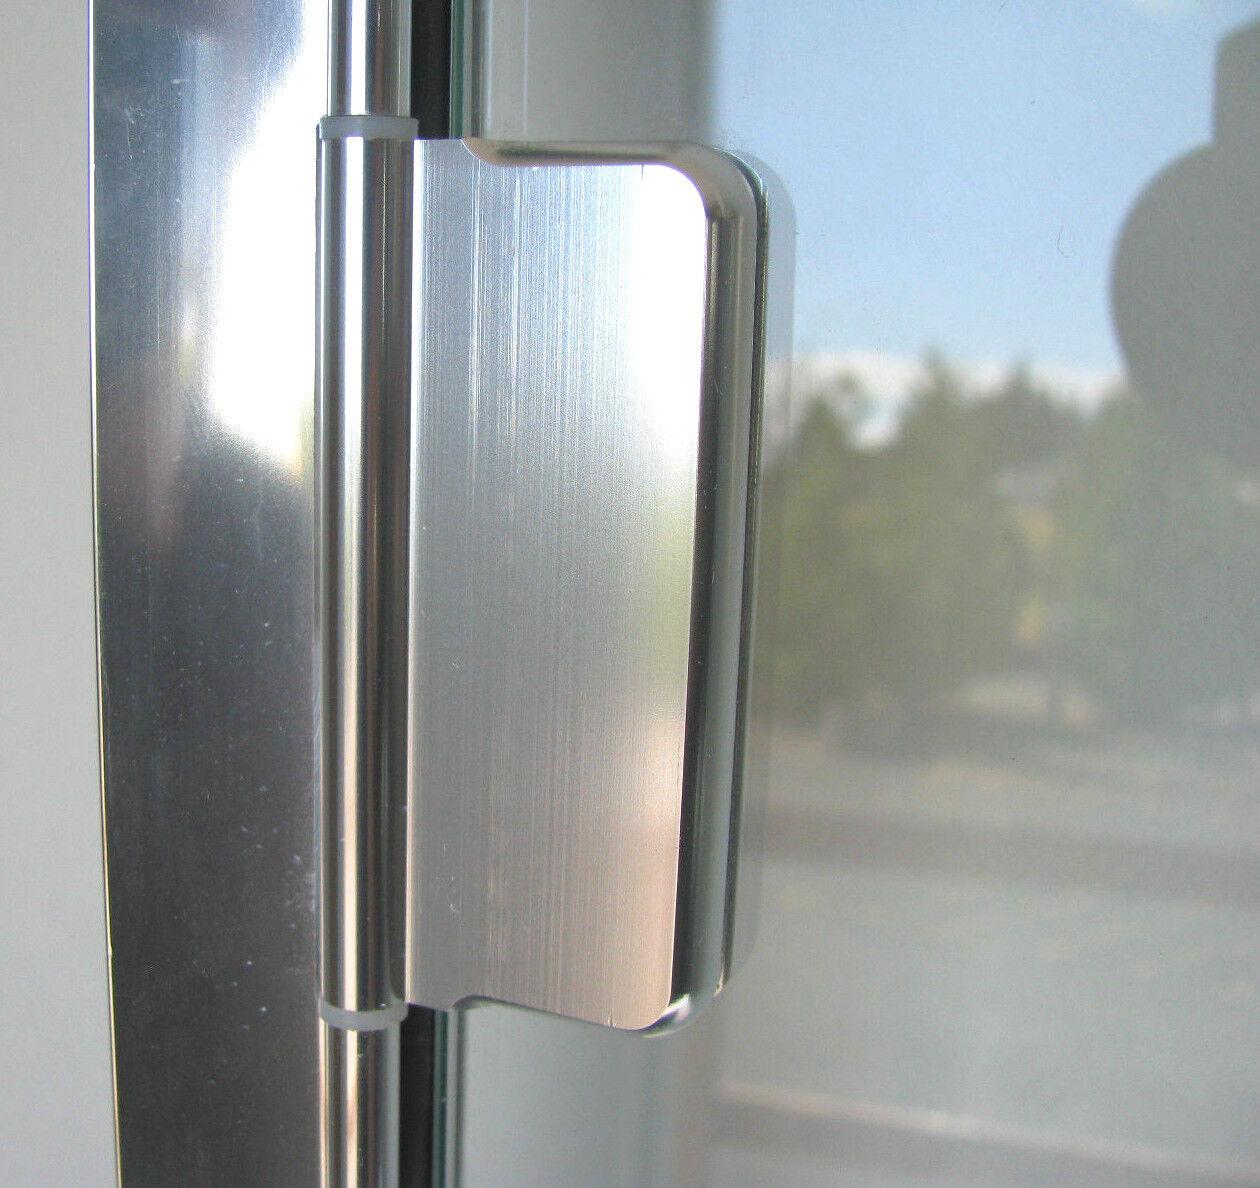 Agalite 14 Semi Frameless Hinged Glass Shower Door Accent